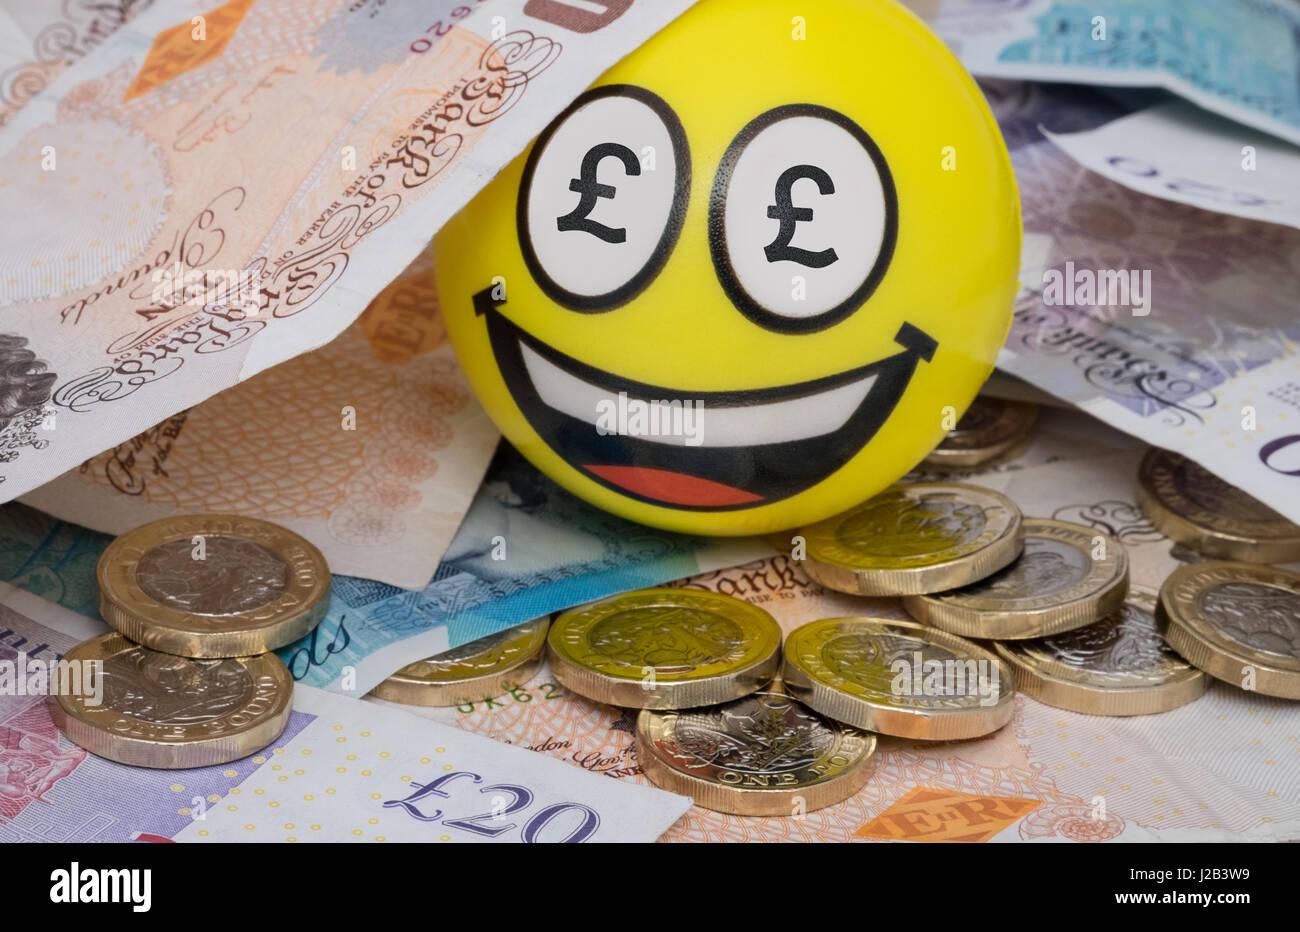 Smiling emoji face in uk money - Stock Image